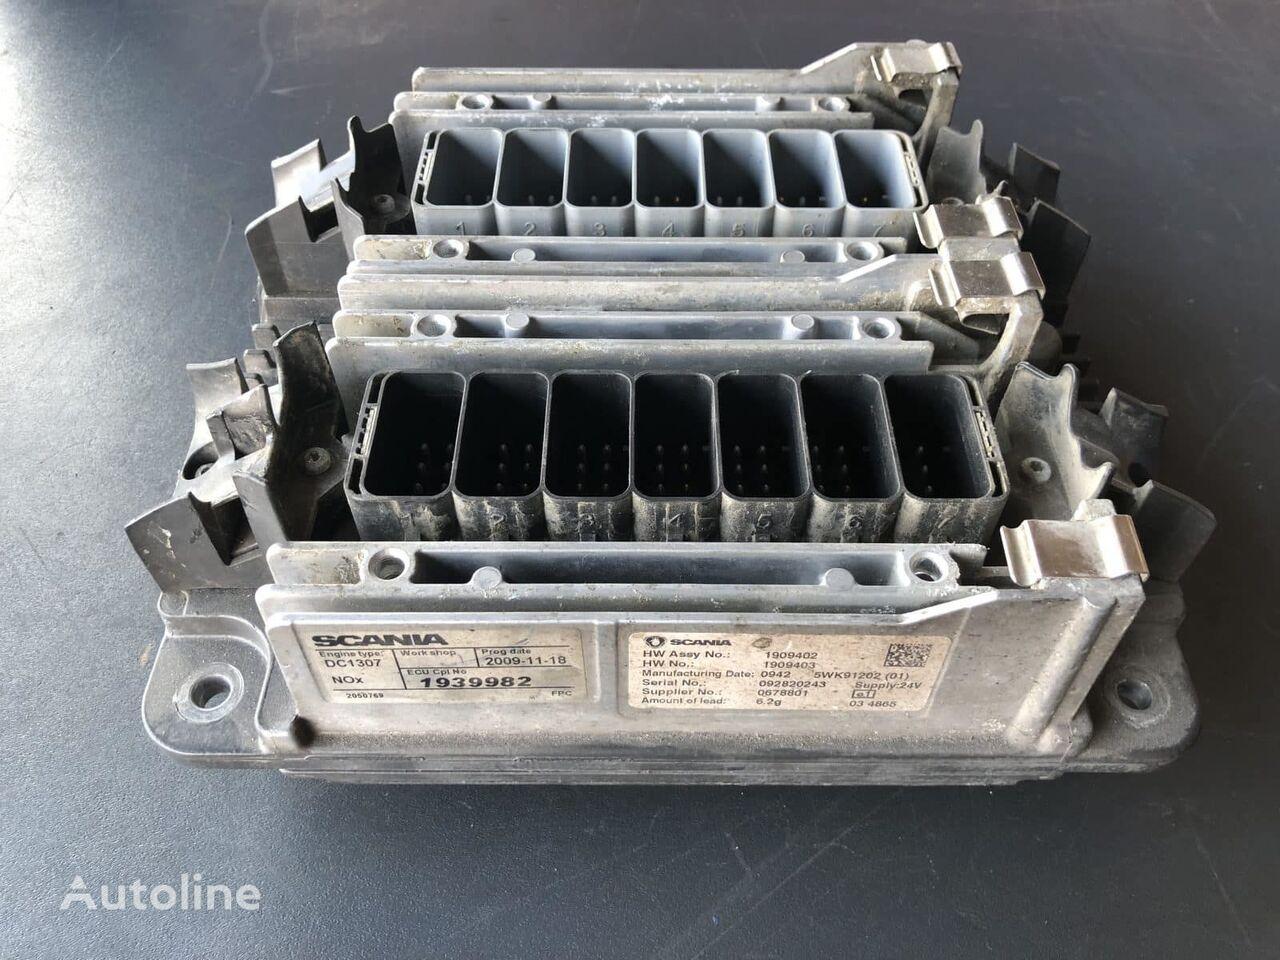 SCANIA ECU DC 13.07 EU5 – XPI – 480hp control unit for truck